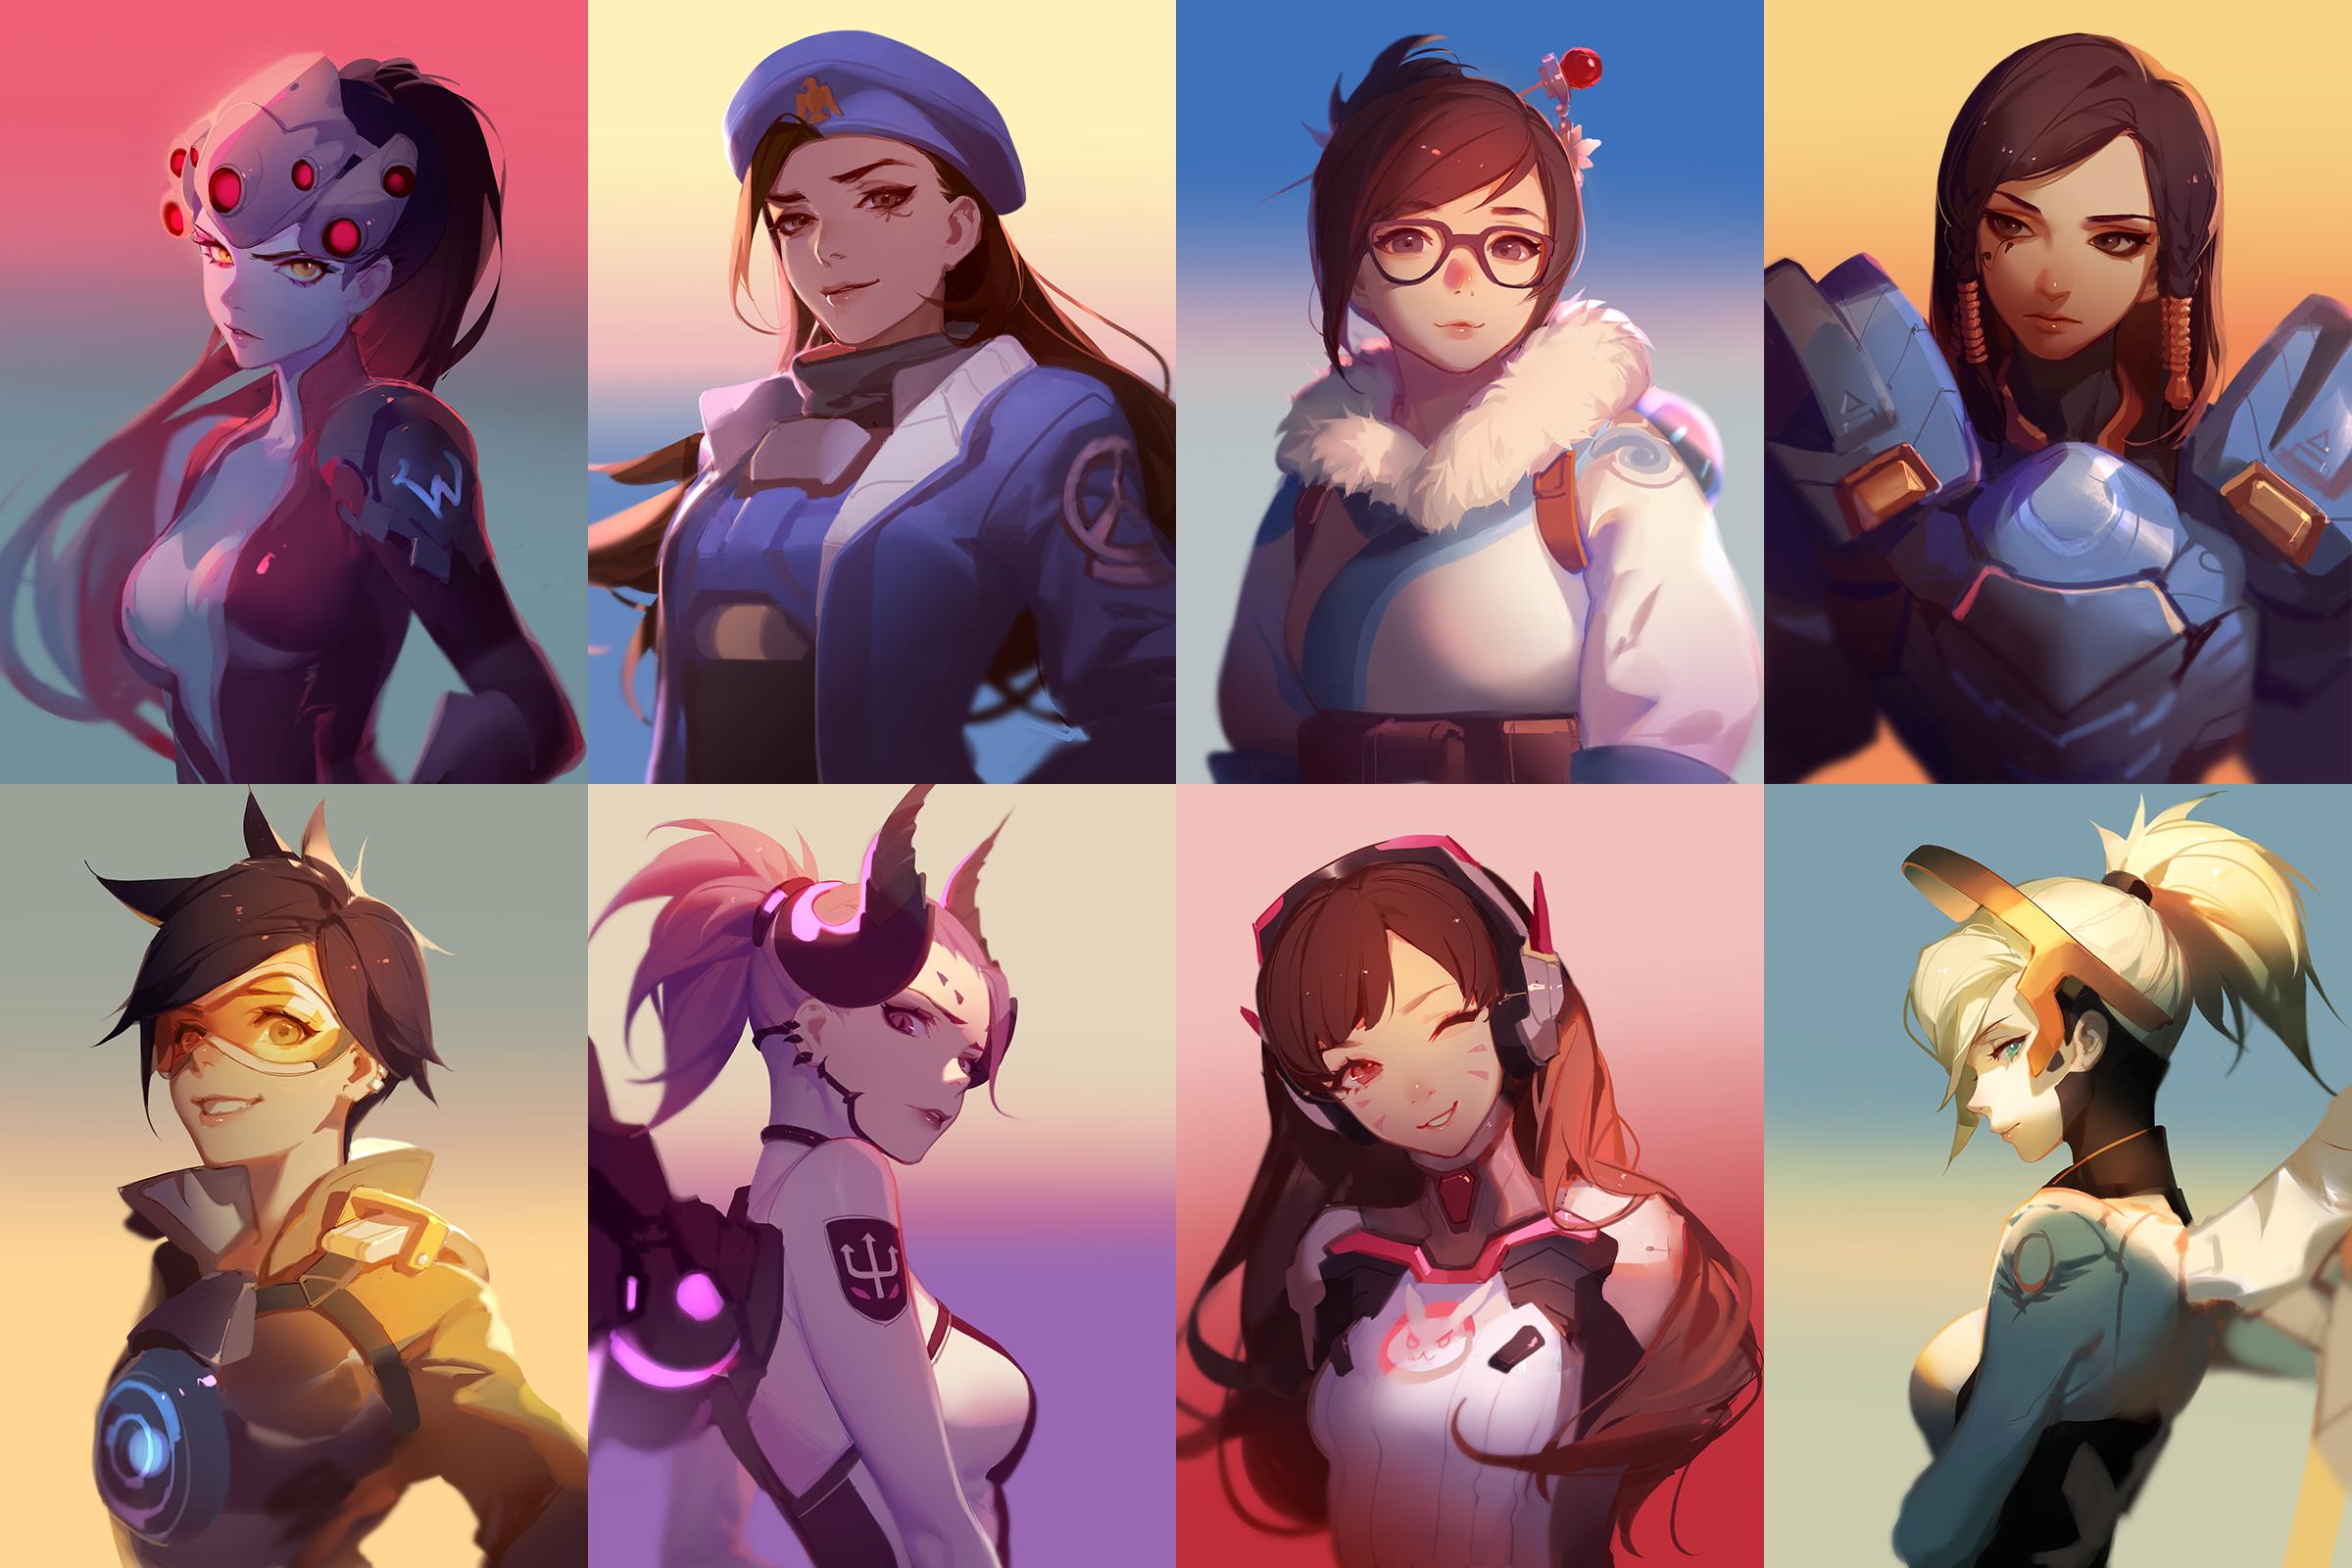 Anime 2400x1600 Ana (Overwatch) Pharah (Overwatch) Tracer (Overwatch) Mercy (Overwatch) Mei (Overwatch) Widowmaker (Overwatch) D.Va (Overwatch) Overwatch collage